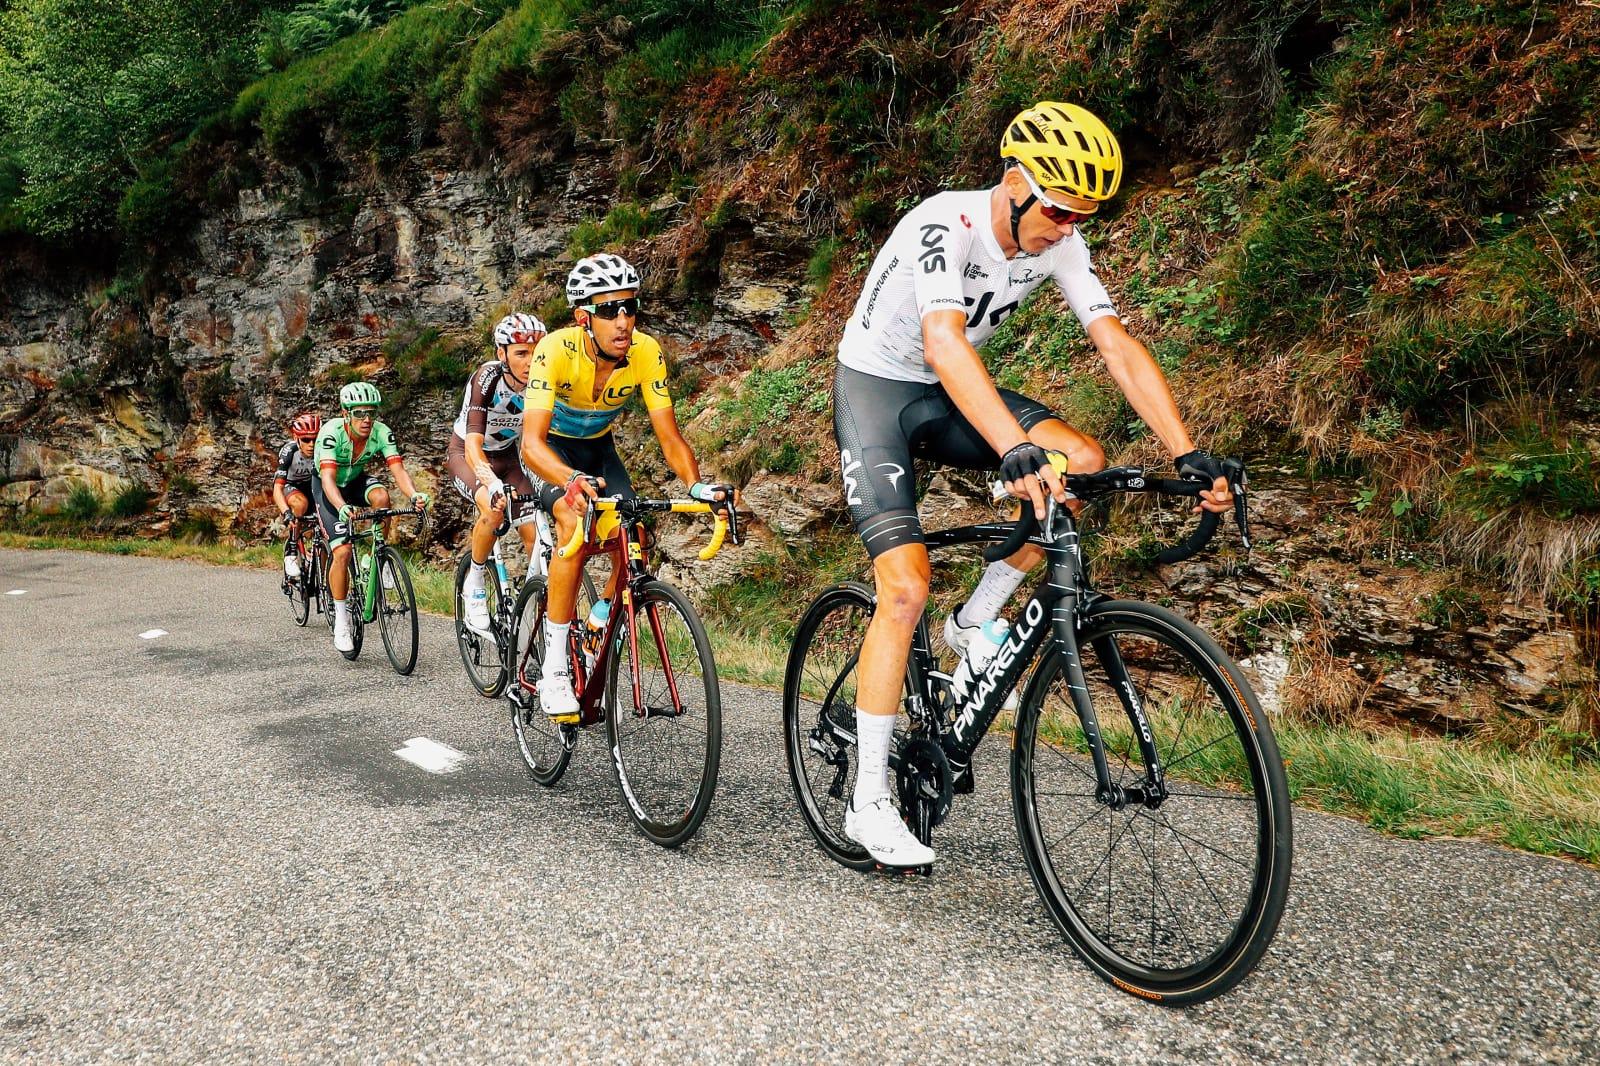 Froome_Aru_Bardet_Uran_Tour Francia_2017_13